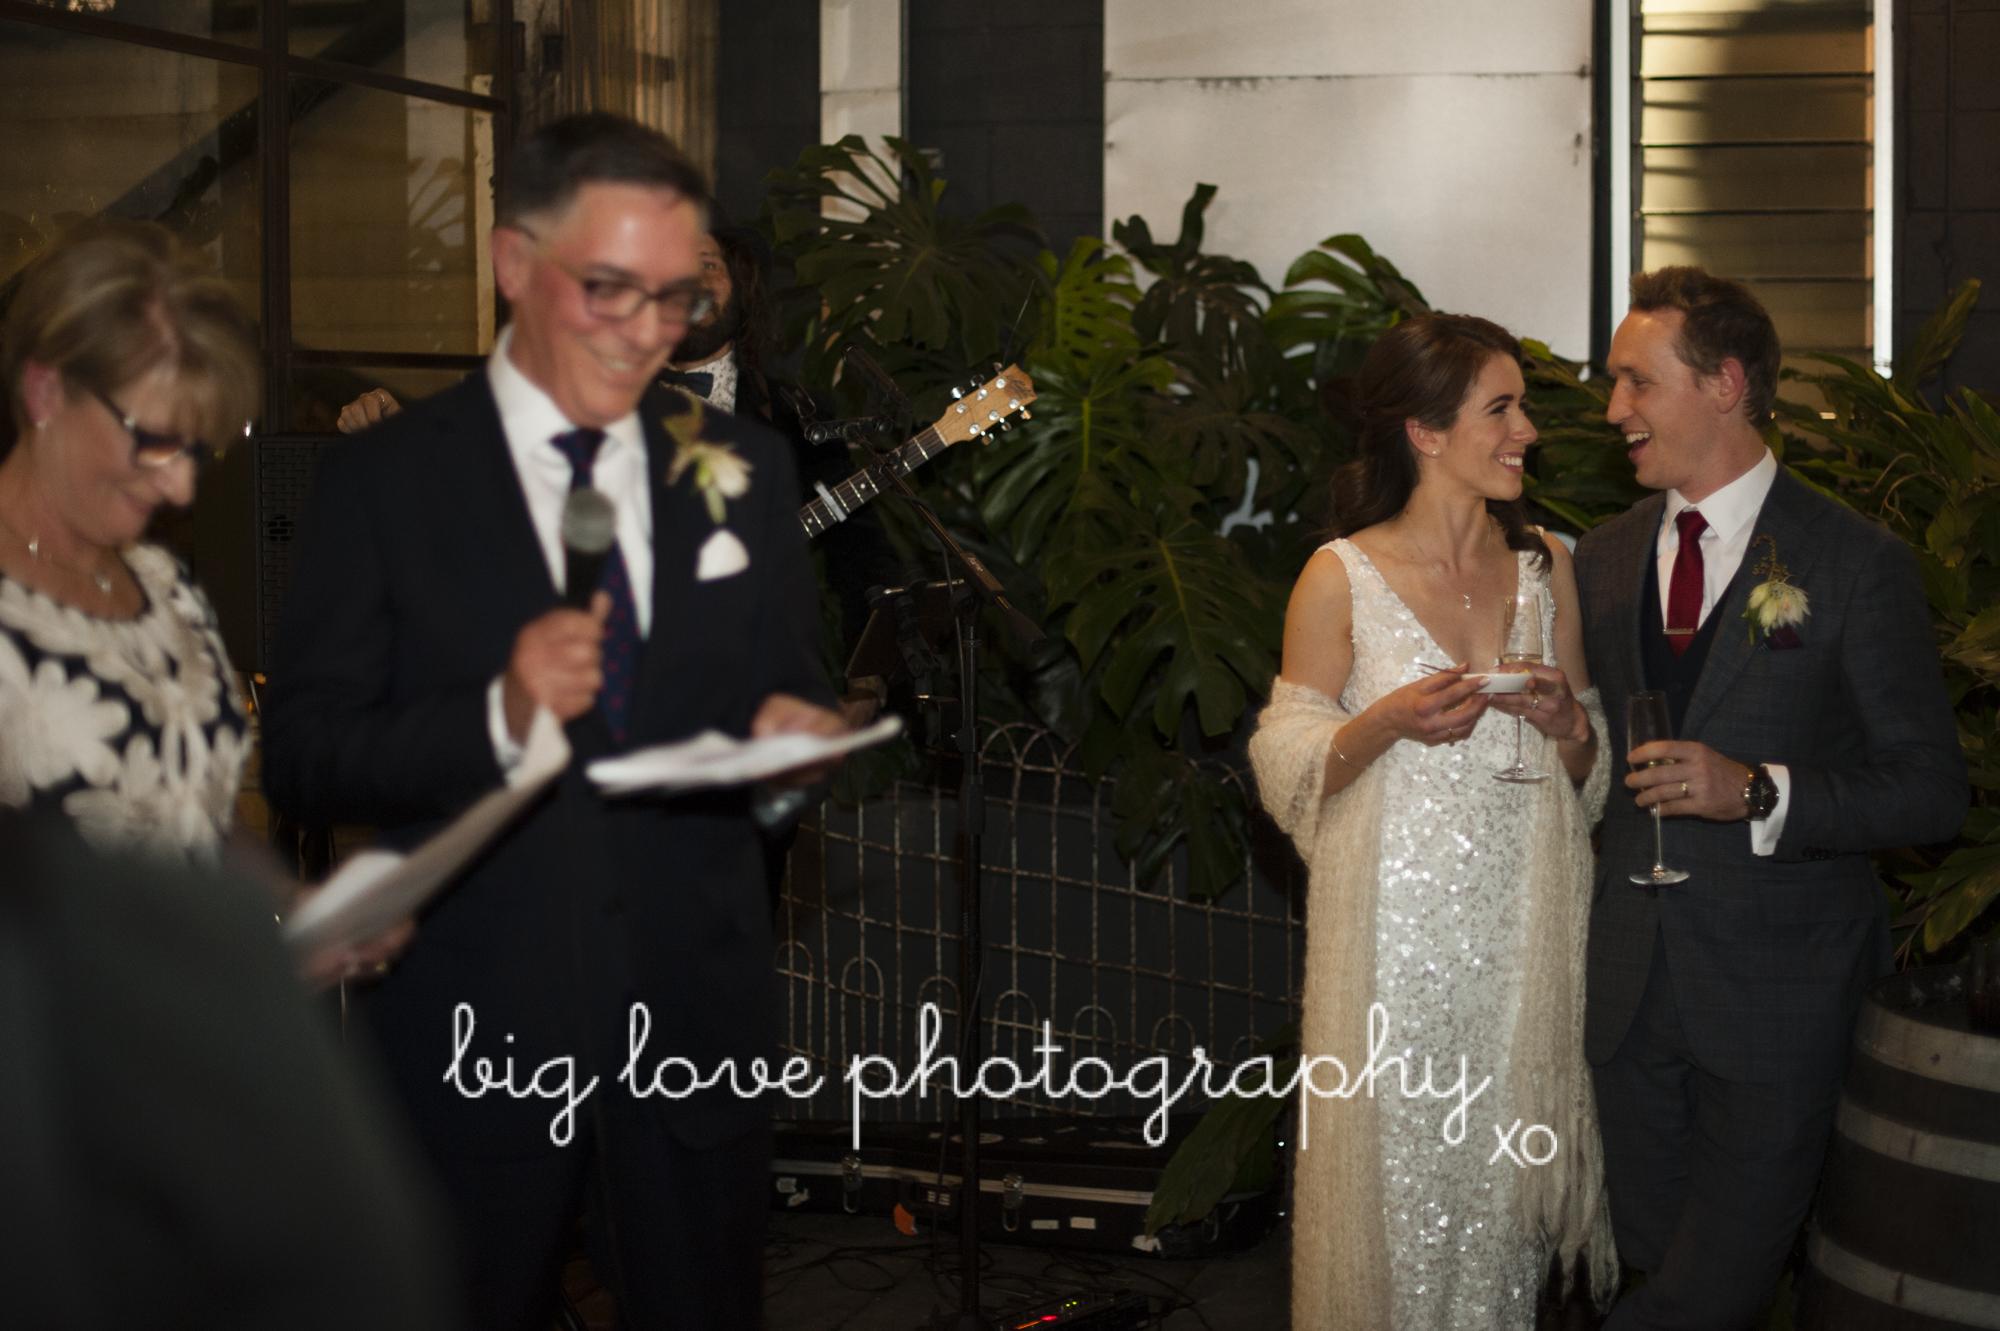 sydneyweddingphotography-4008.jpg